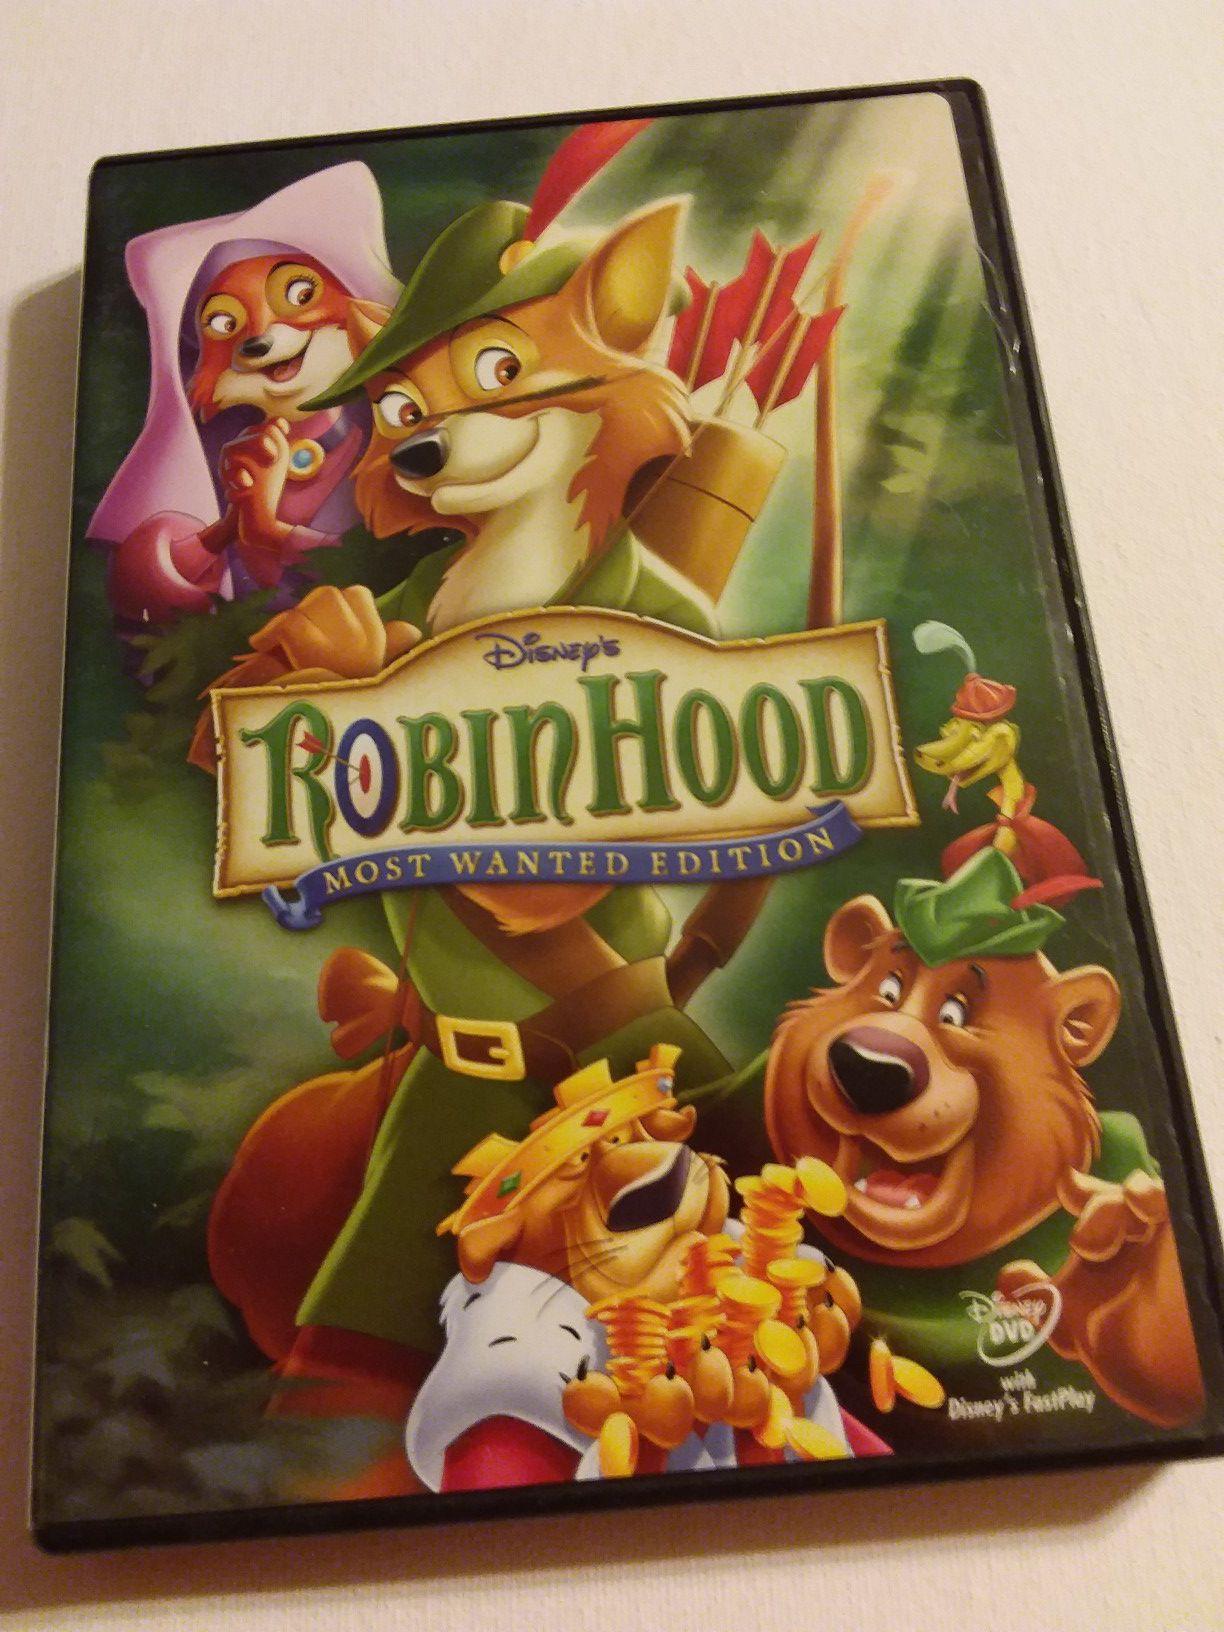 Robin Hood DVD $8.00